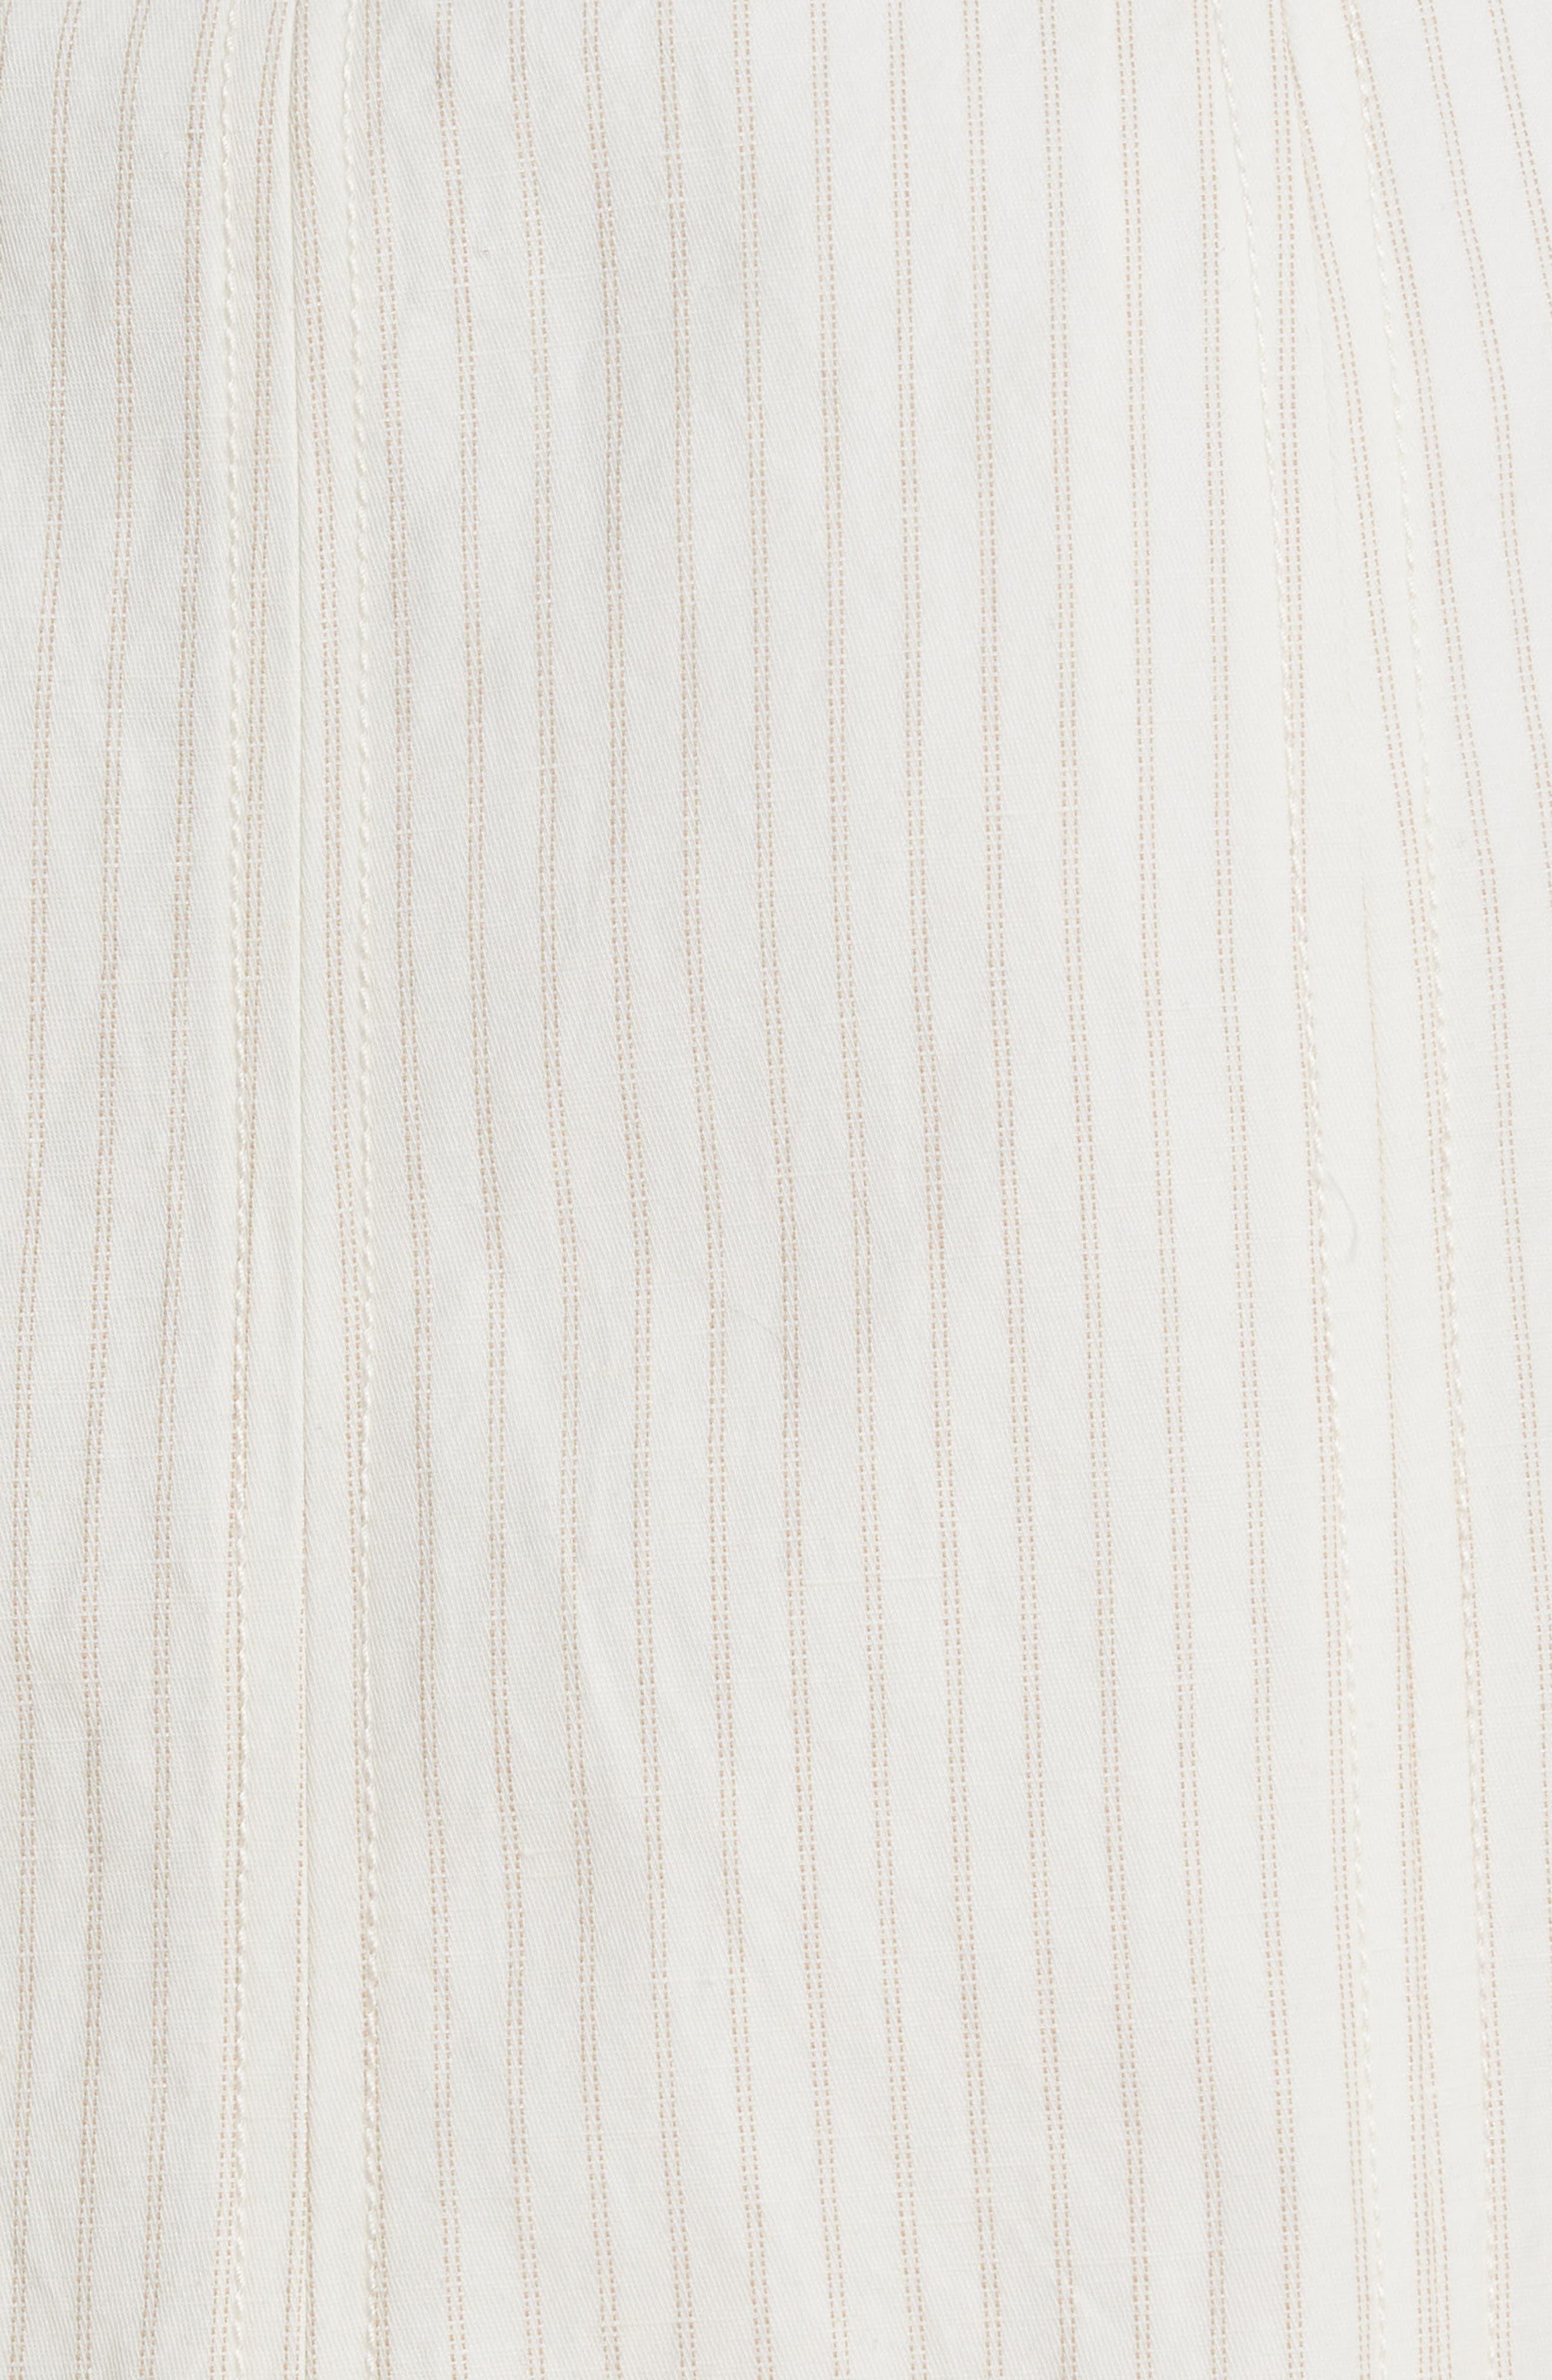 REBECCA TAYLOR, Zip Front Pinstripe Cotton & Linen Skirt, Alternate thumbnail 5, color, SNOW COMBO